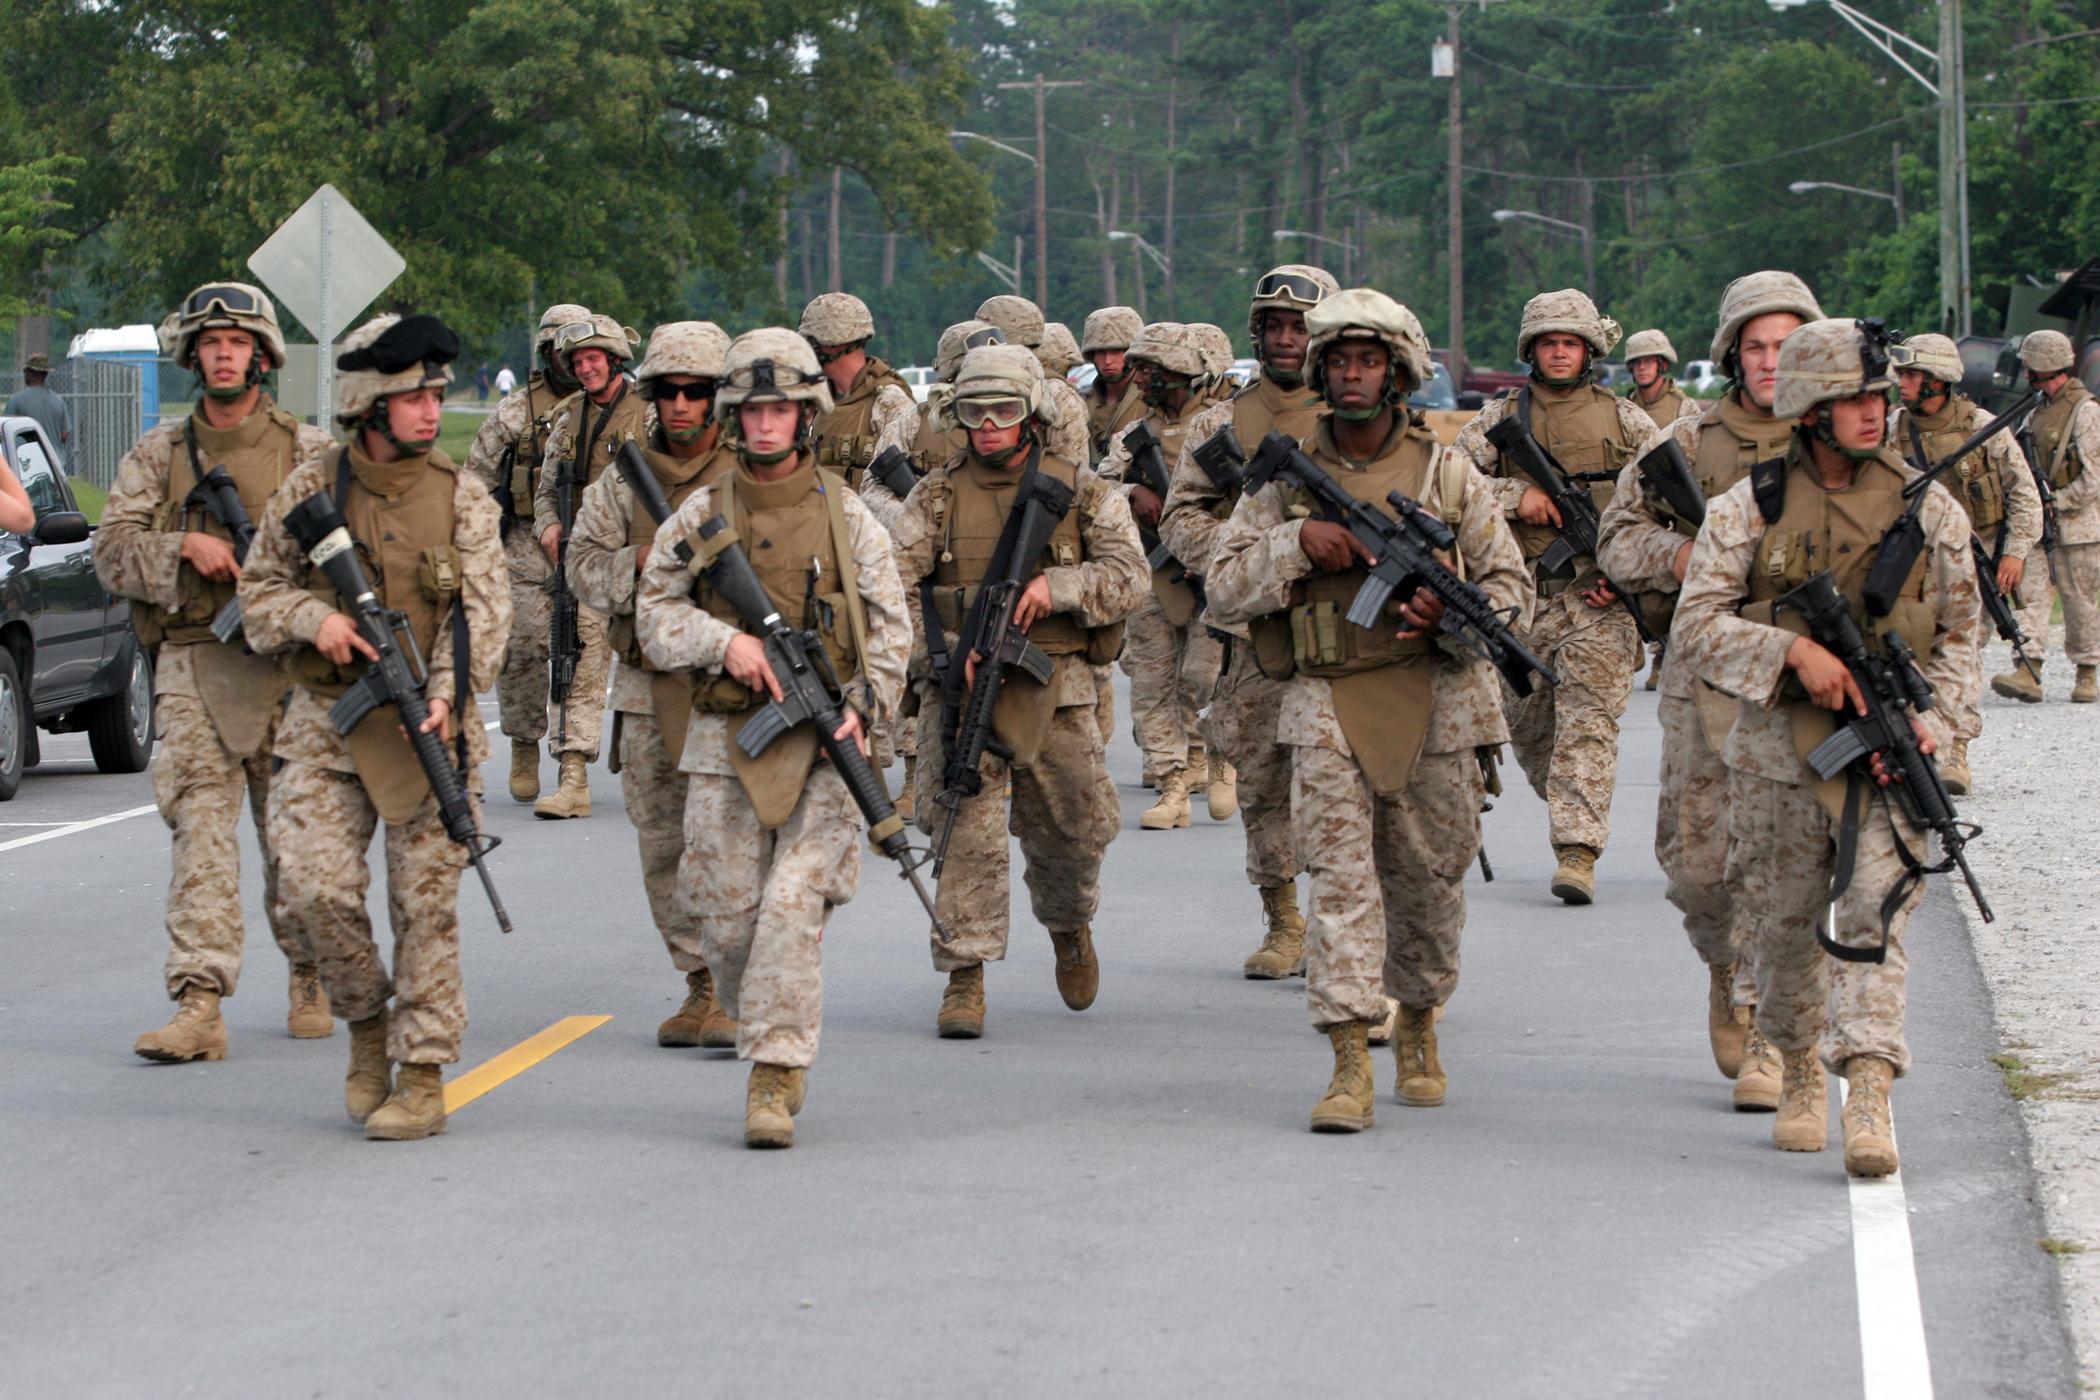 https://media.defense.gov/2007/Jun/22/3655/-1/-1/0/070622-m-3095k-003.jpg